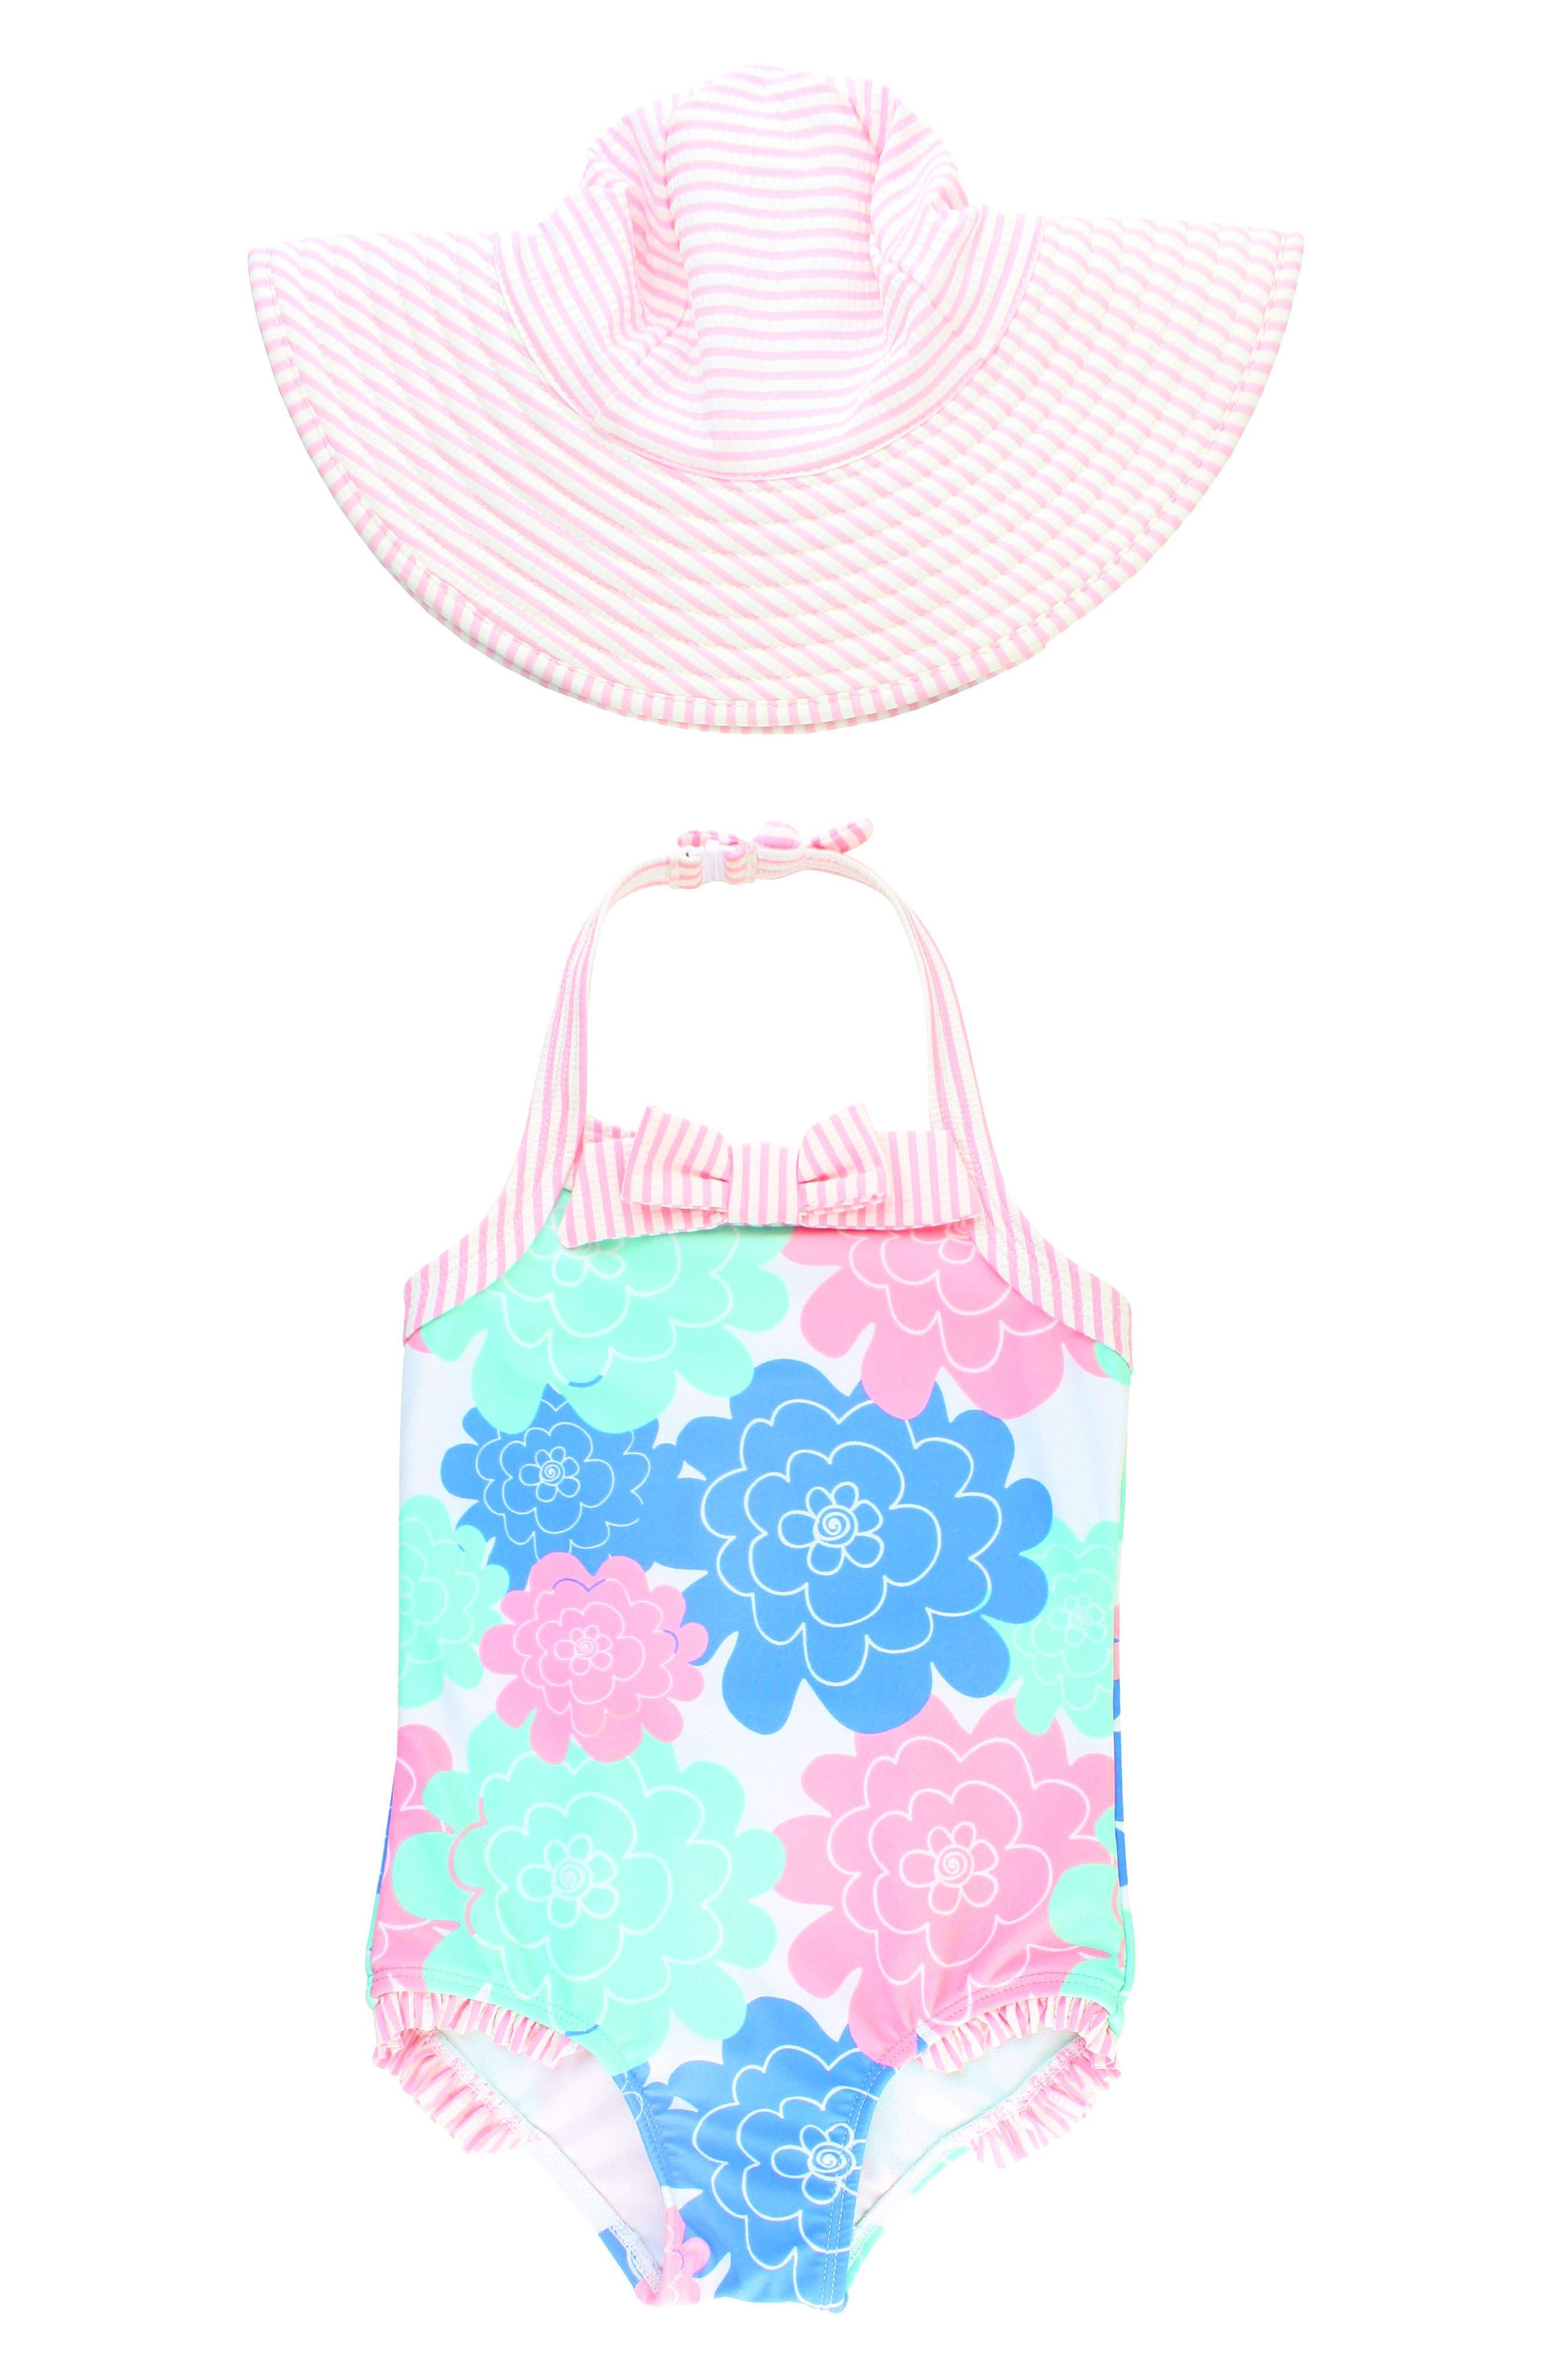 Main Image - RuffleButts One-Piece Halter Swimsuit & Hat Set (Toddler Girls)